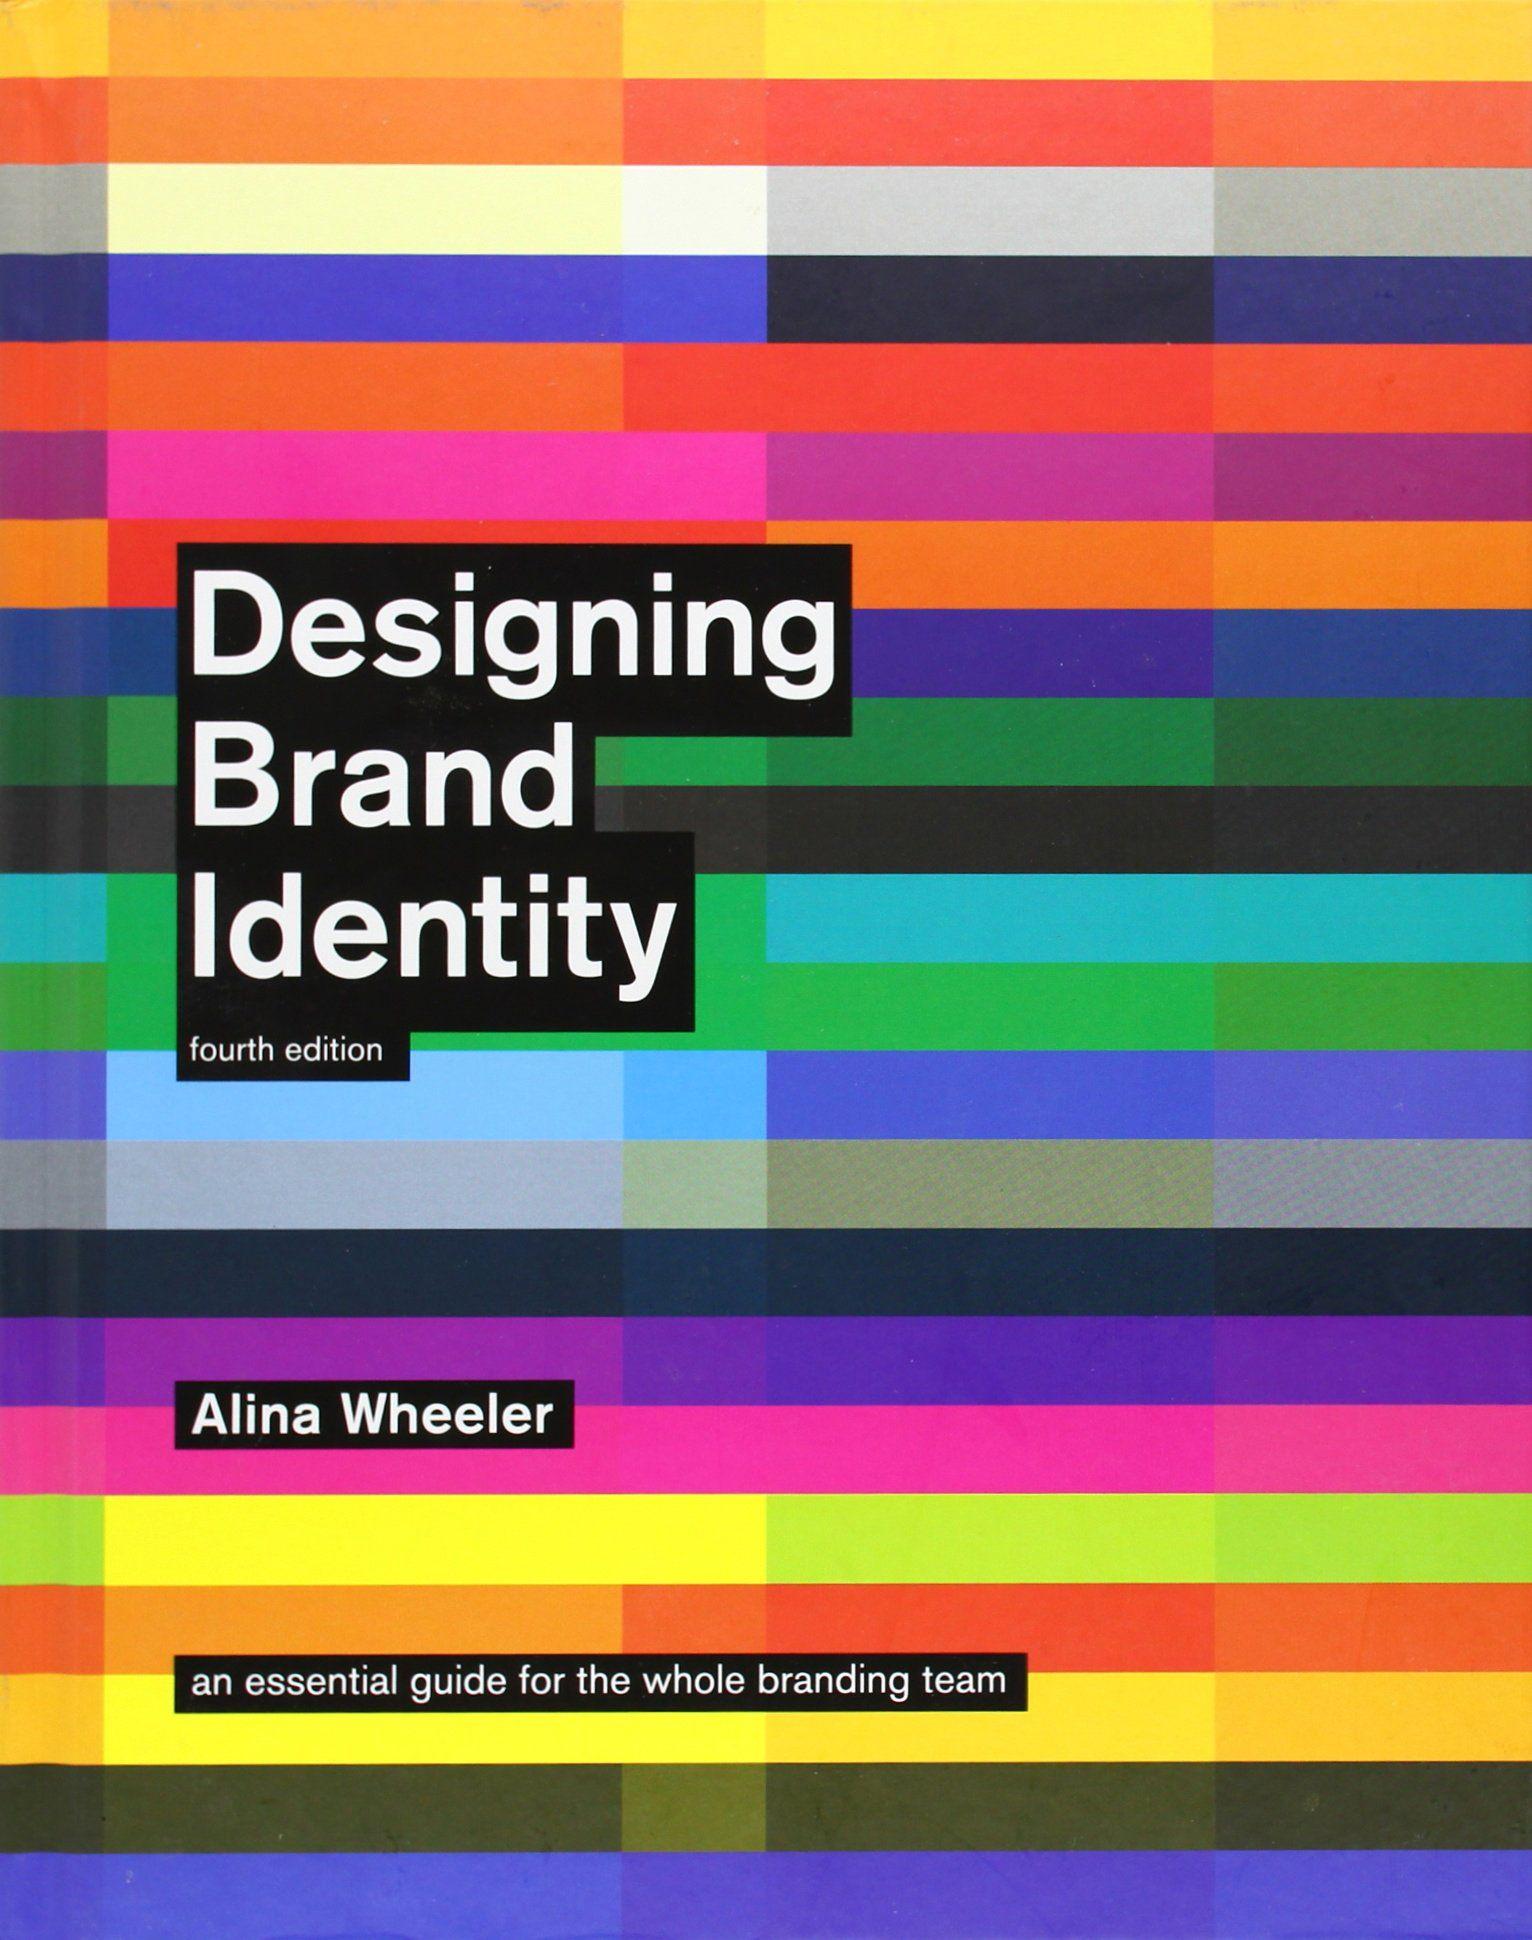 Designing Brand Identity Alina Wheeler Pdf